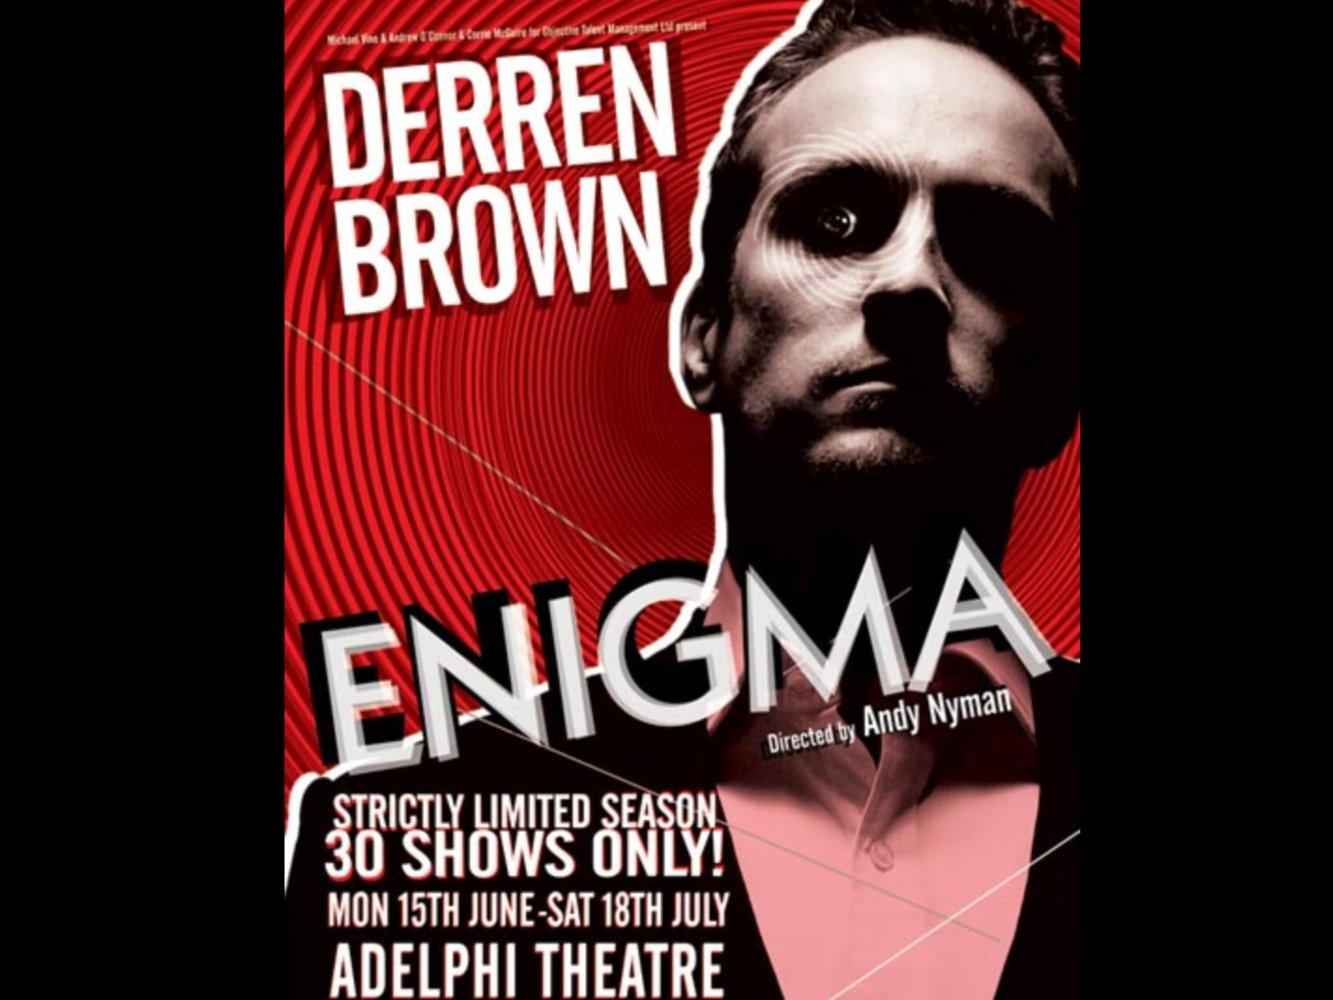 Derren Brown: Enigma